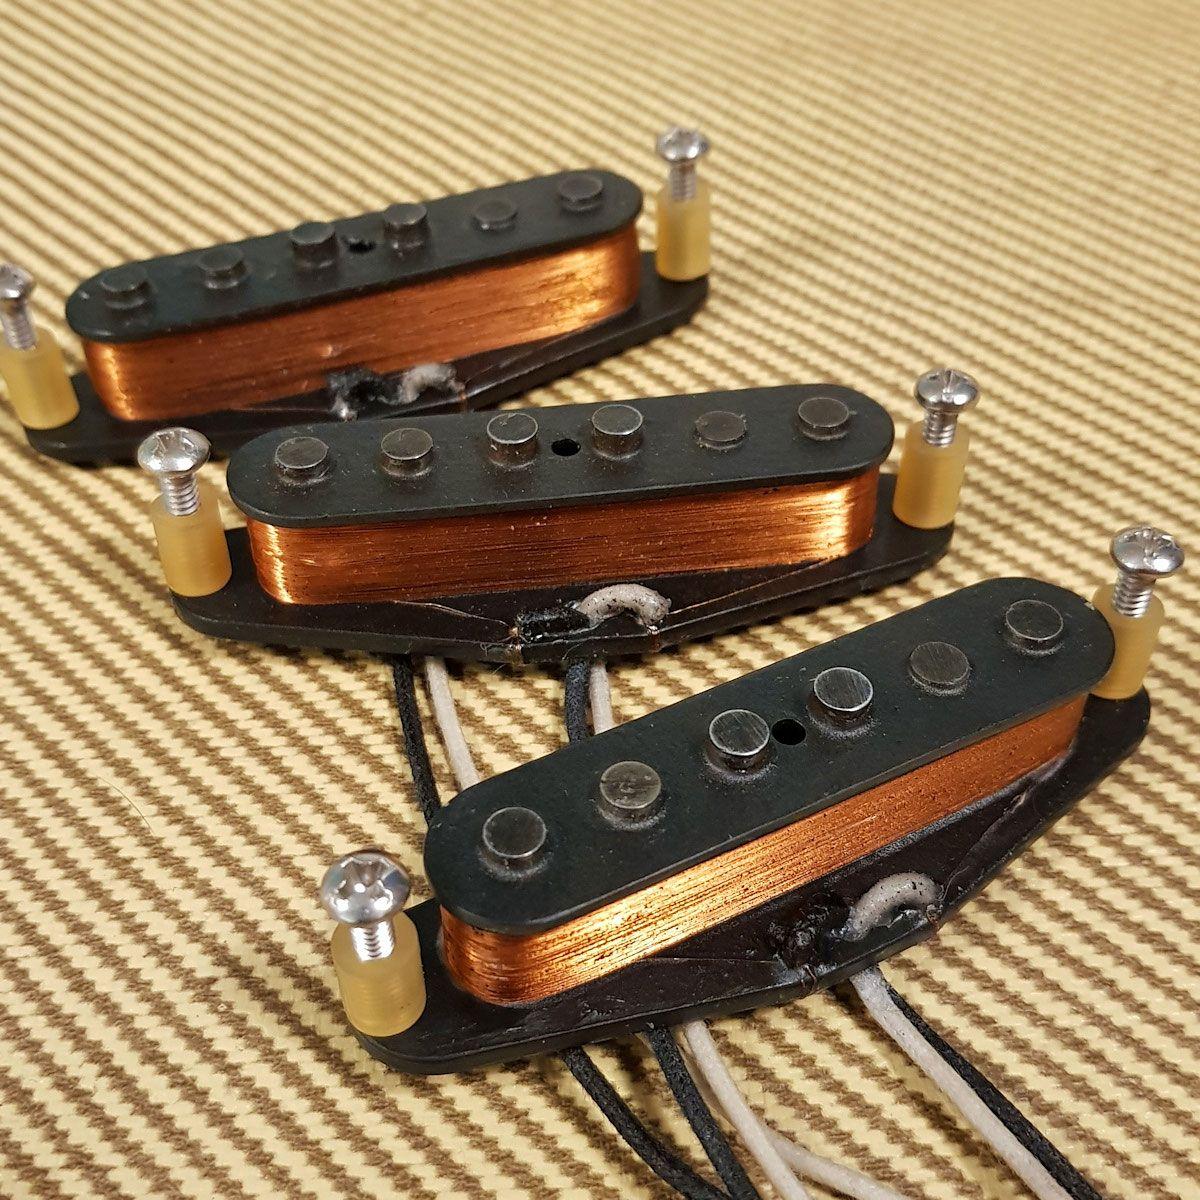 Best VINTAGE GUITAR PICKUPS for Stratocaster Telecaster P-Bass J-Bass Jazz Bass Precision Bass Tele Strat Les Paul ES-335 Flying V #vintageguitars